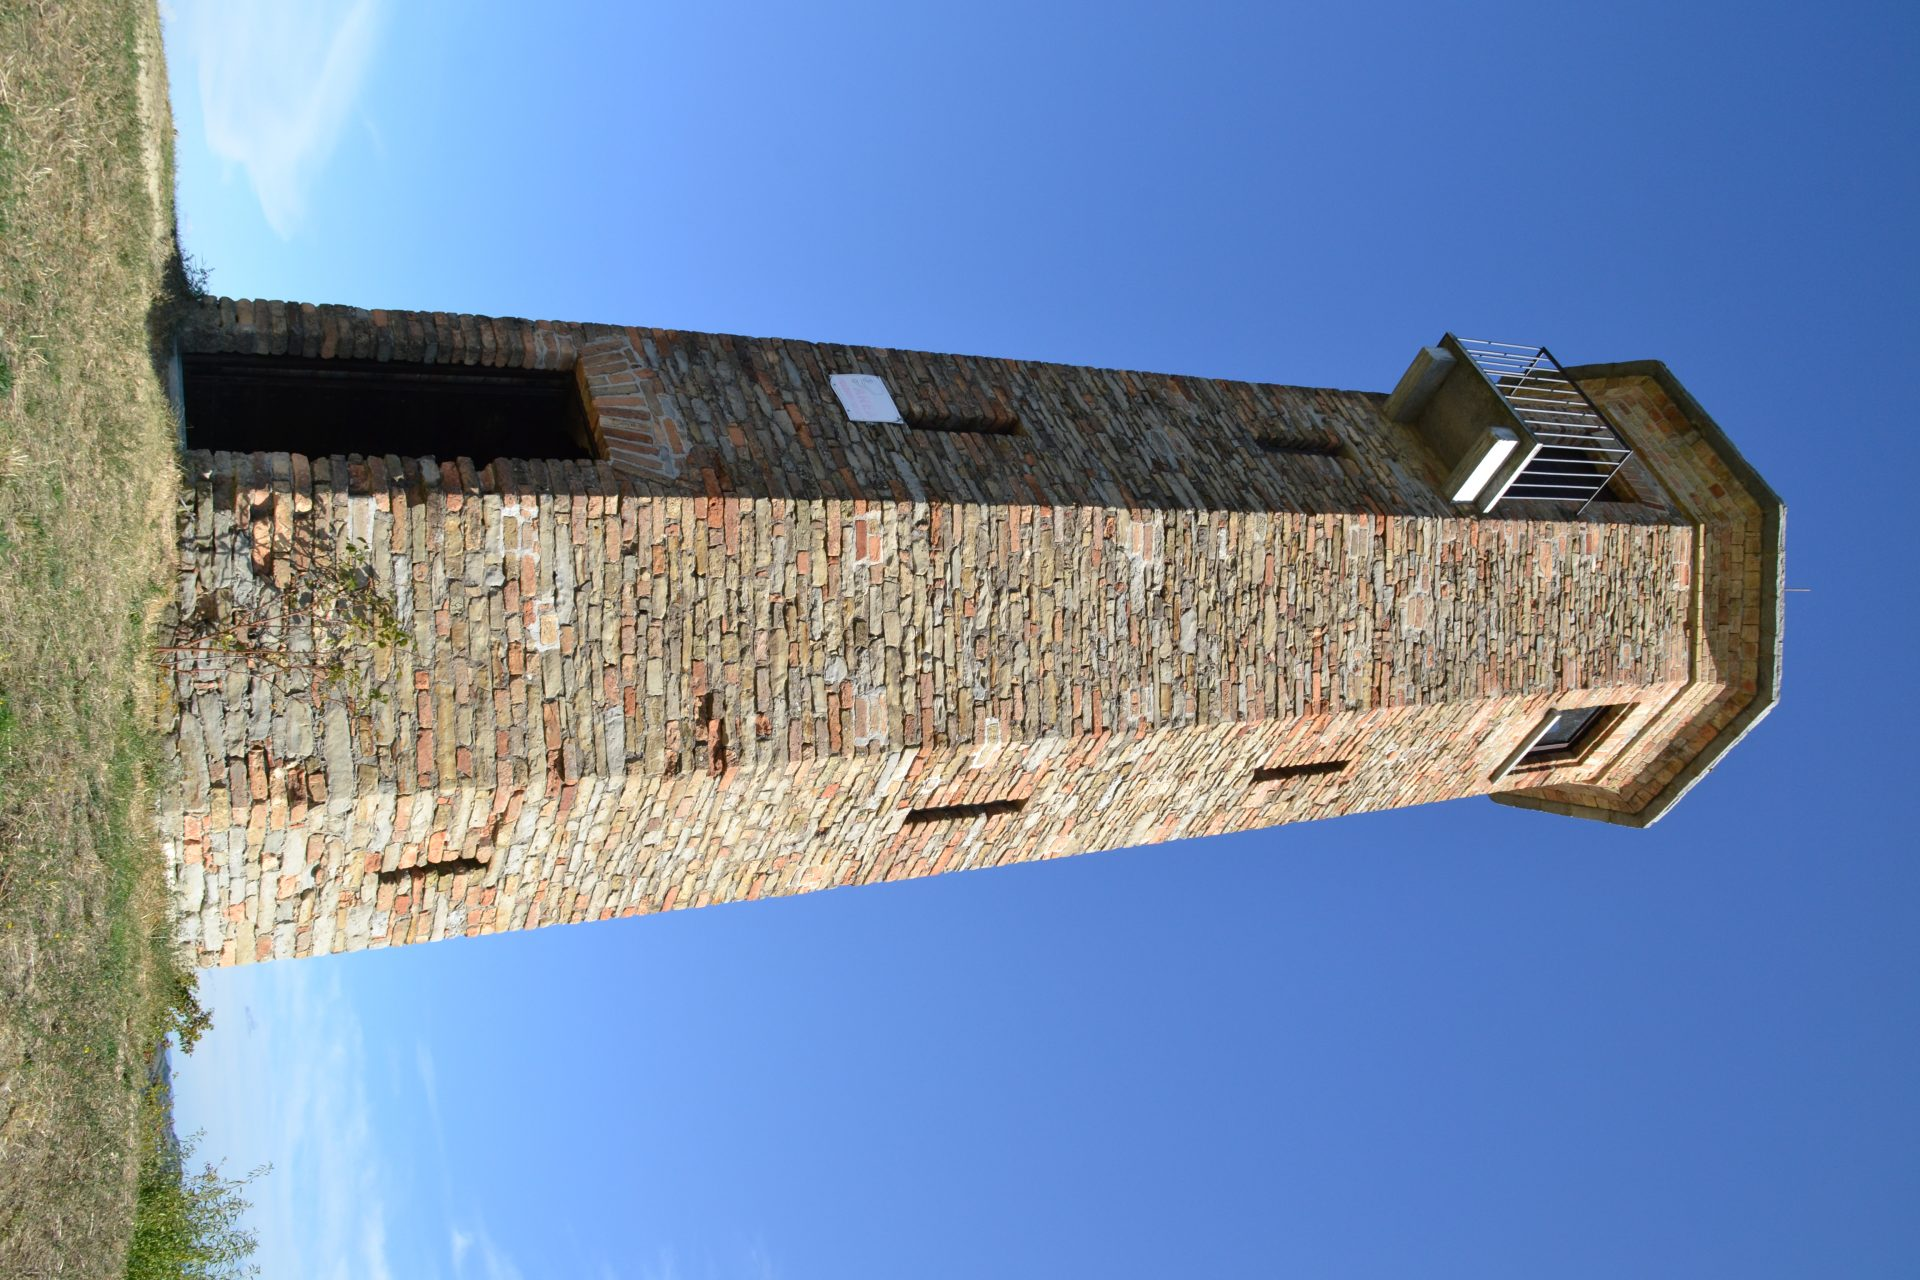 Uitkijktoren vlakbij Agliano Terme Torre dei Contini